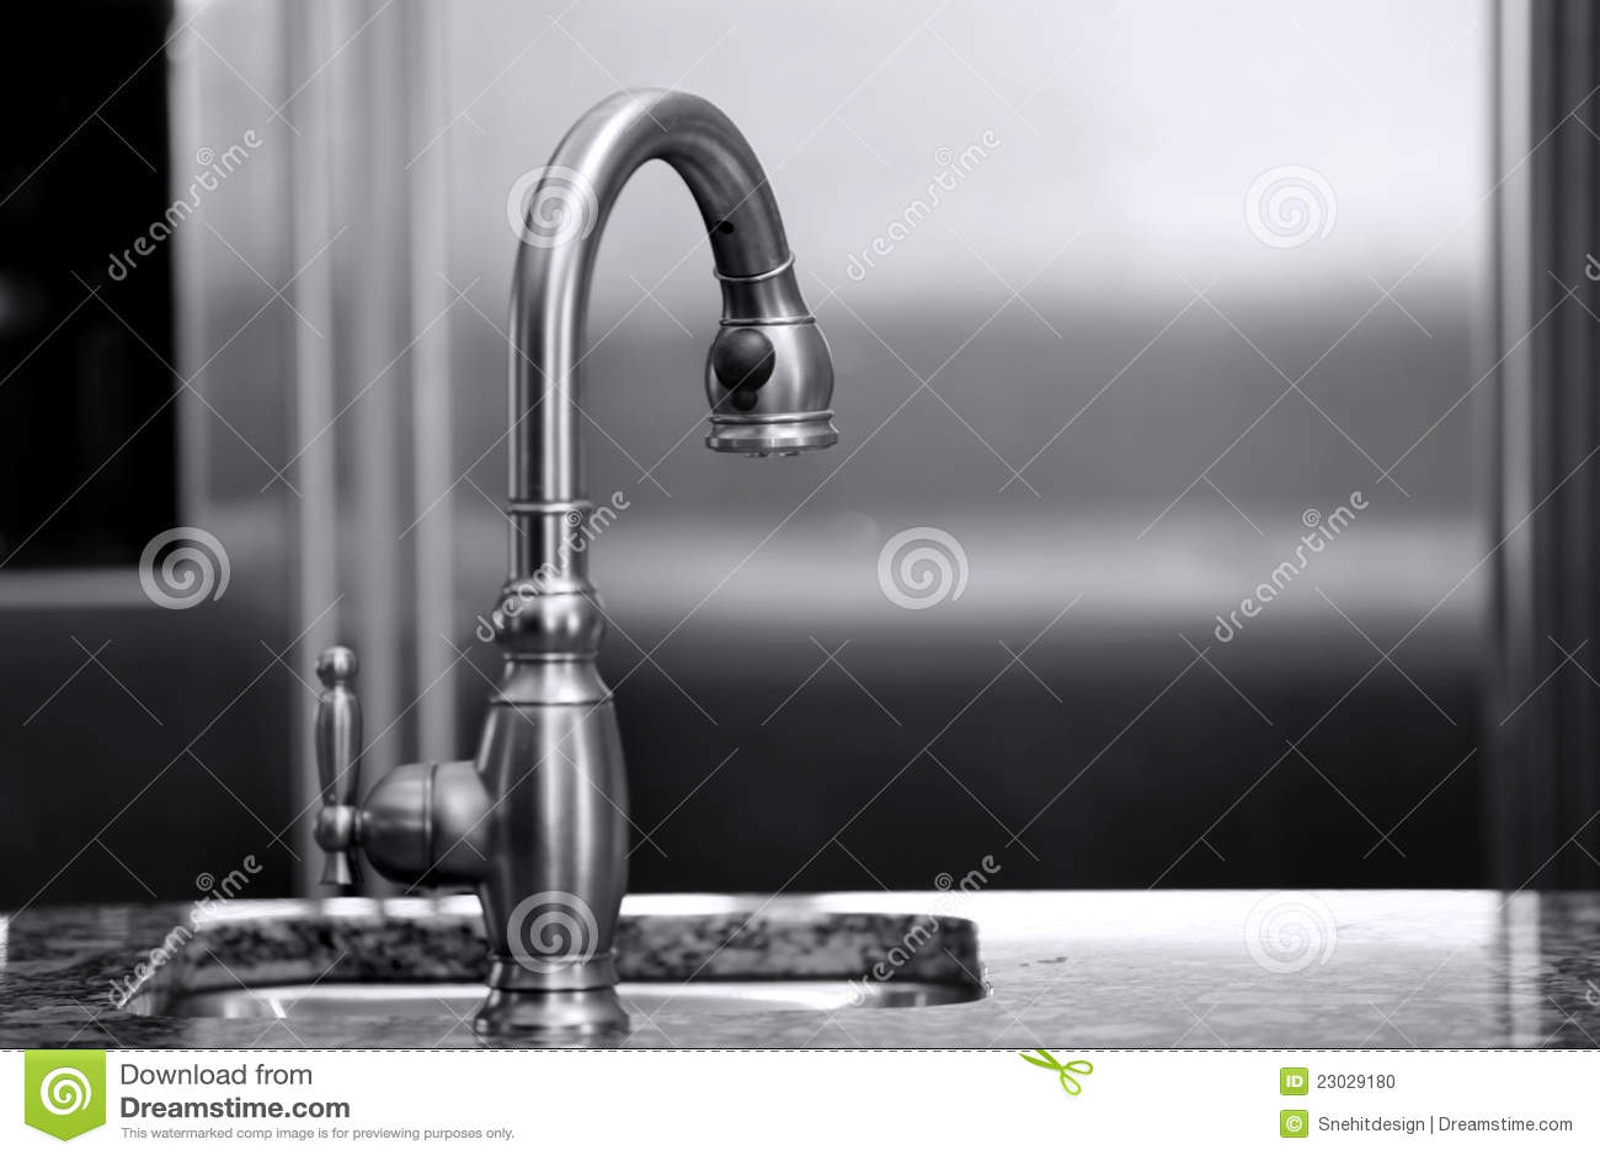 Robinet lavabo salle de bain ikea - Robinet salle de bain ikea ...